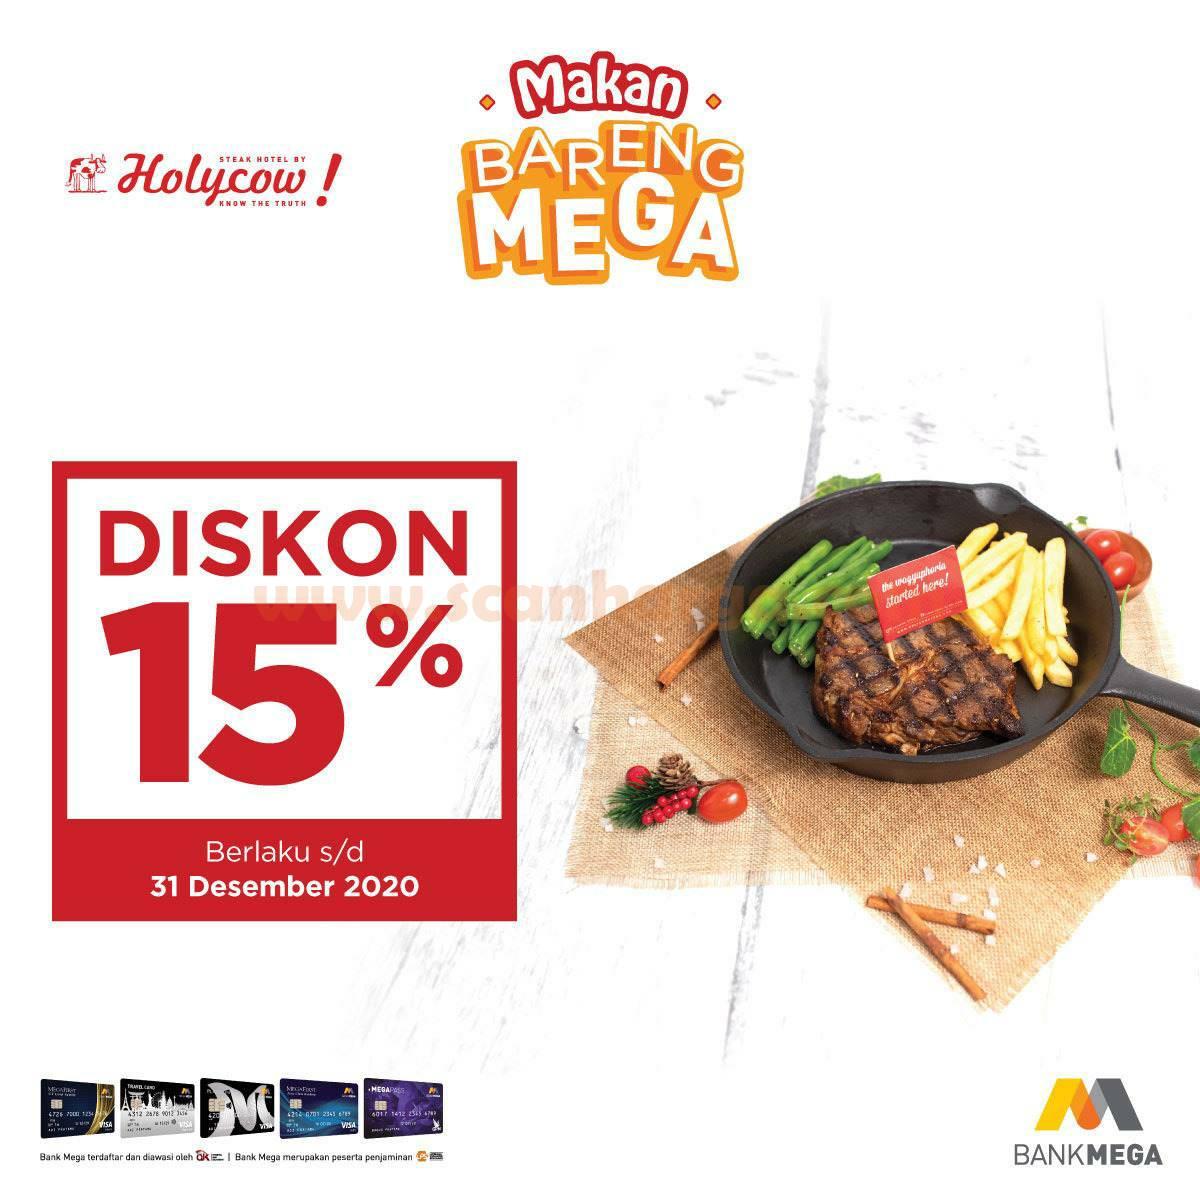 Promo Steak Hotel by Holycow Diskon 15% dengan Kartu Kredit & Debit Bank Mega